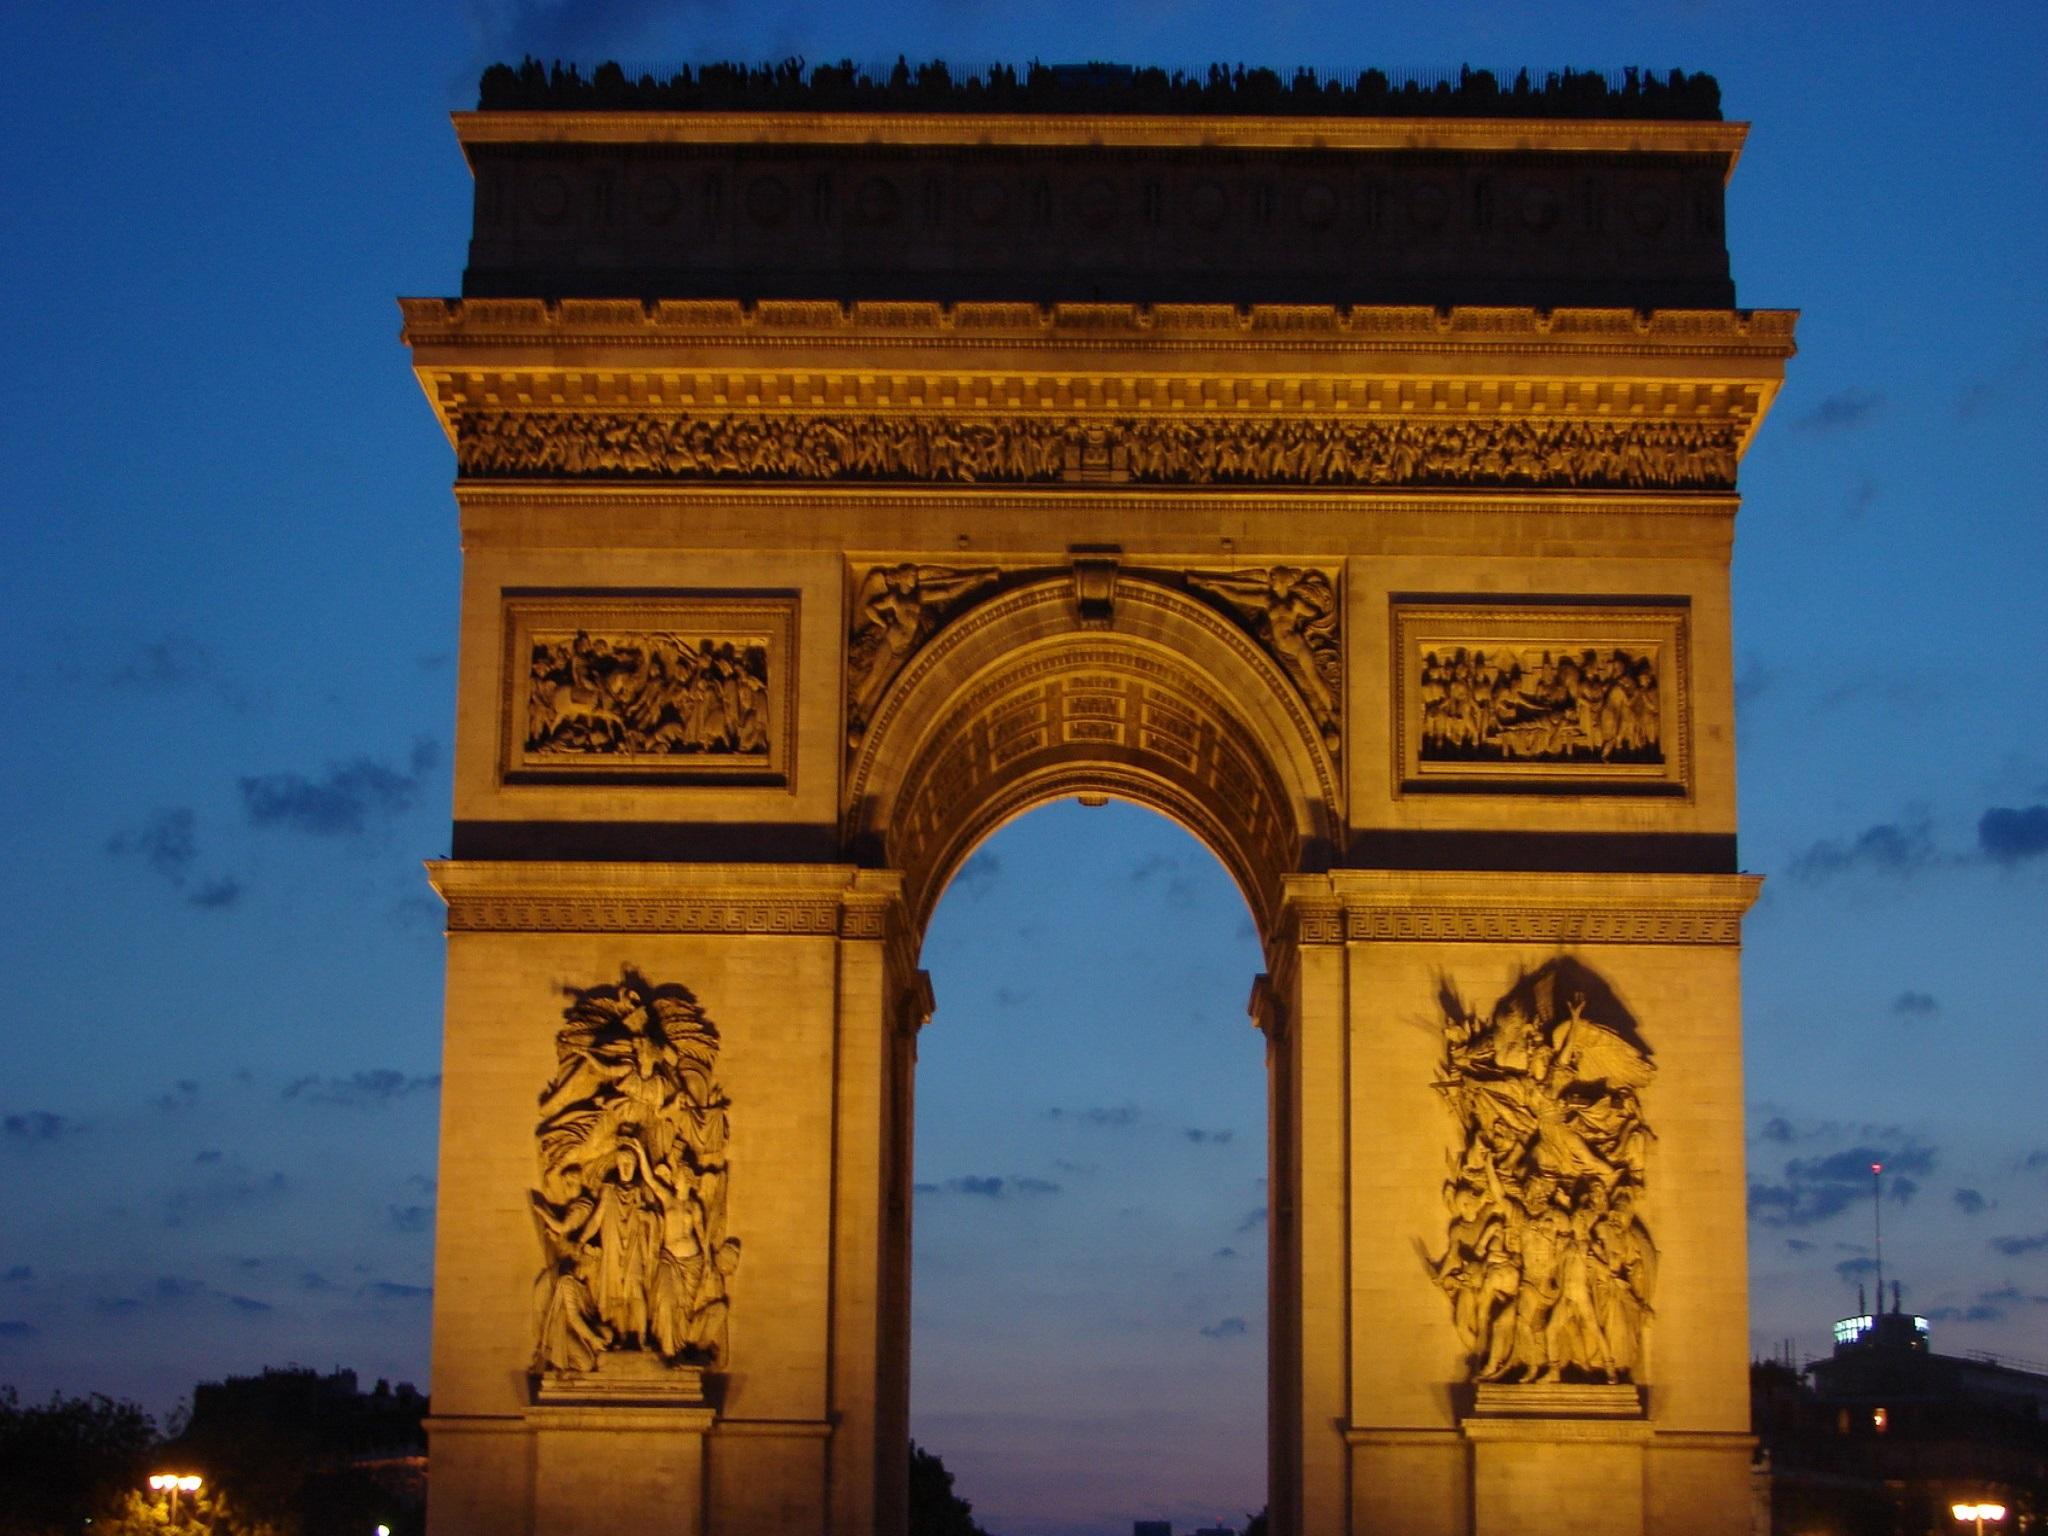 arc de triomphe a monument in paris travel featured. Black Bedroom Furniture Sets. Home Design Ideas